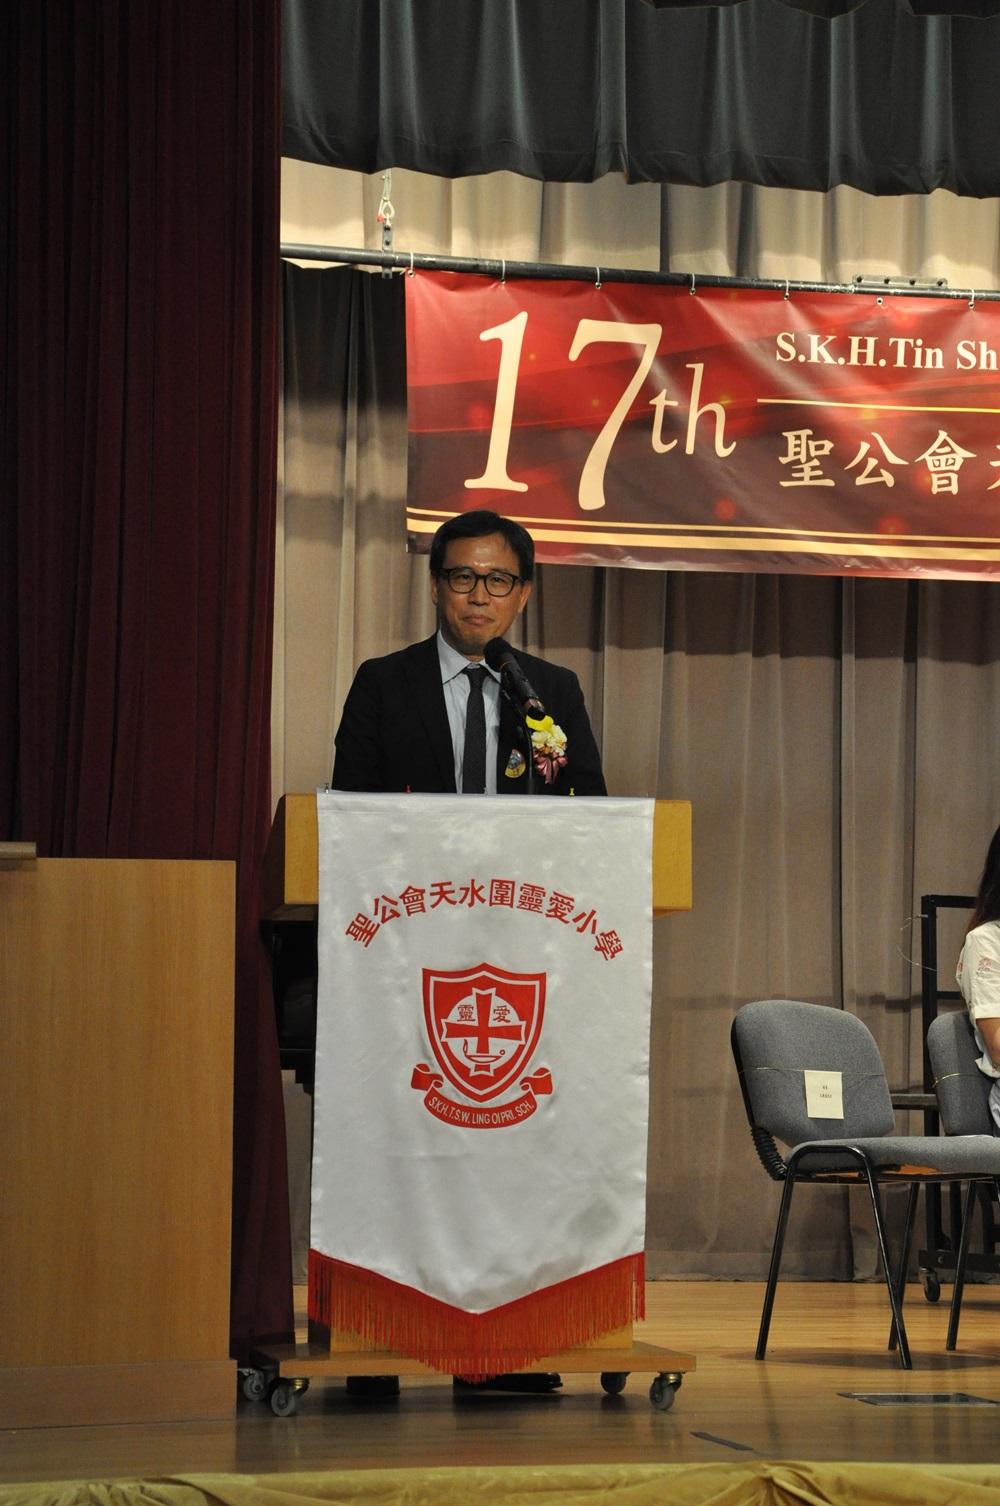 https://skhtswlo.edu.hk/sites/default/files/dsc_0035_1.jpg